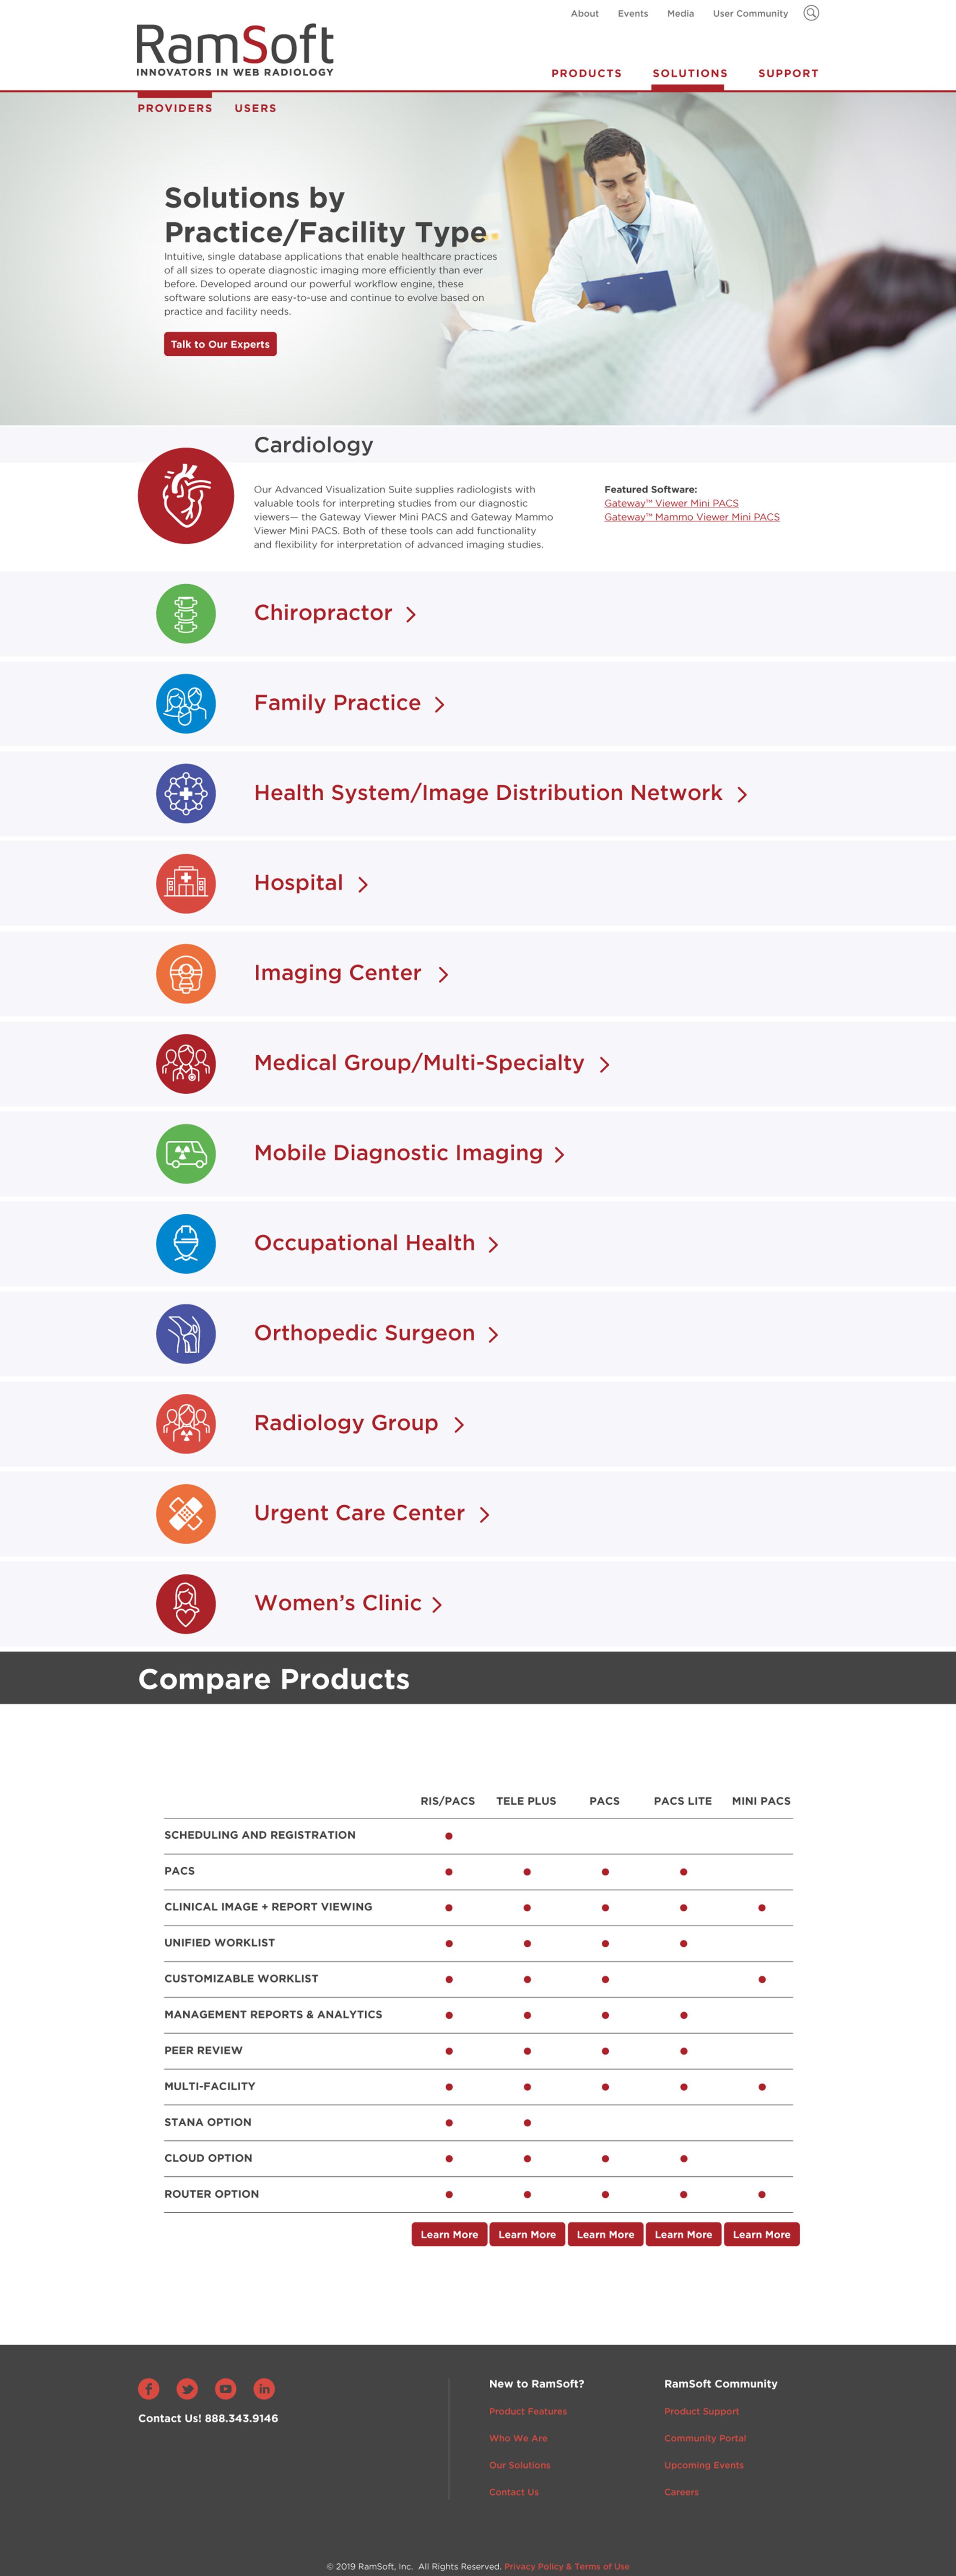 Ramsoft Web Design Providers